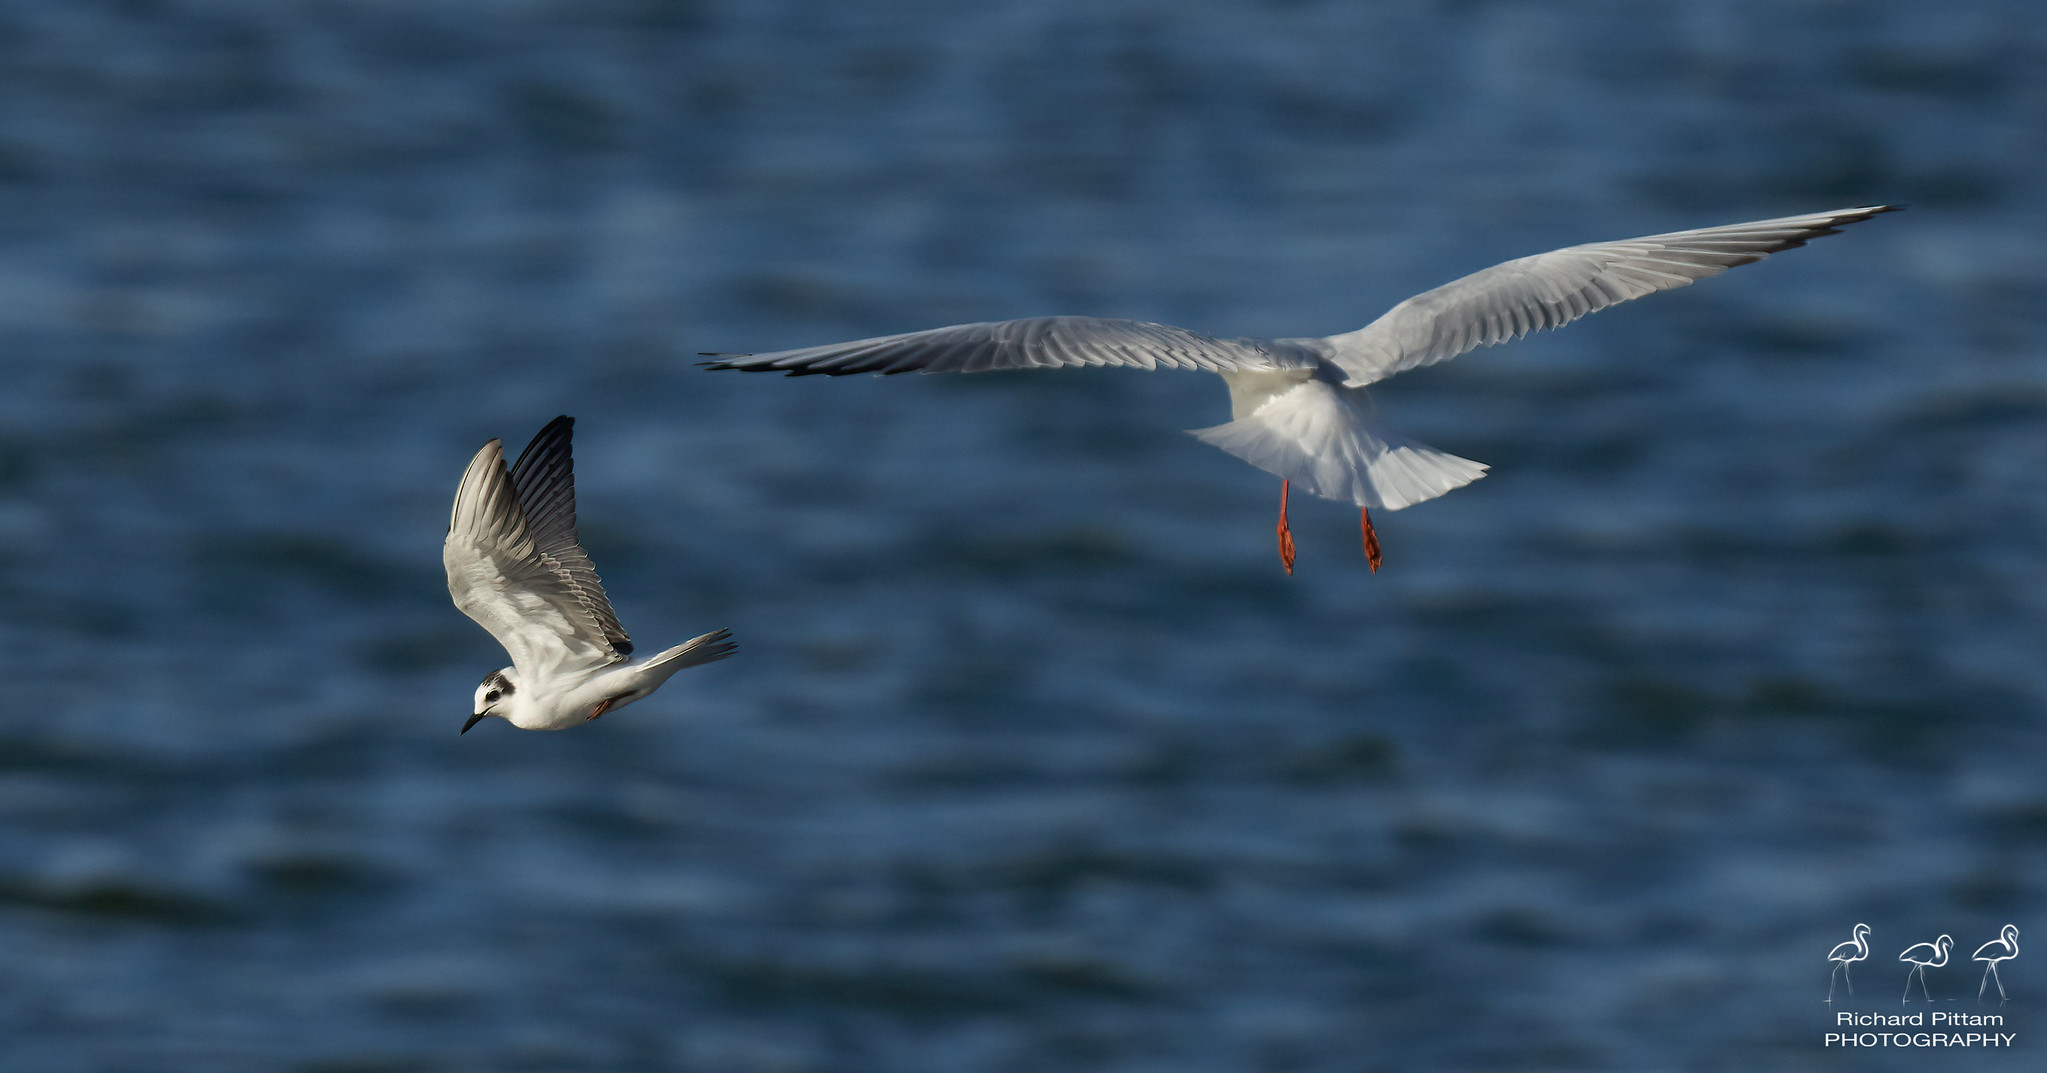 White-winged [black] Tern - harassed by gulls